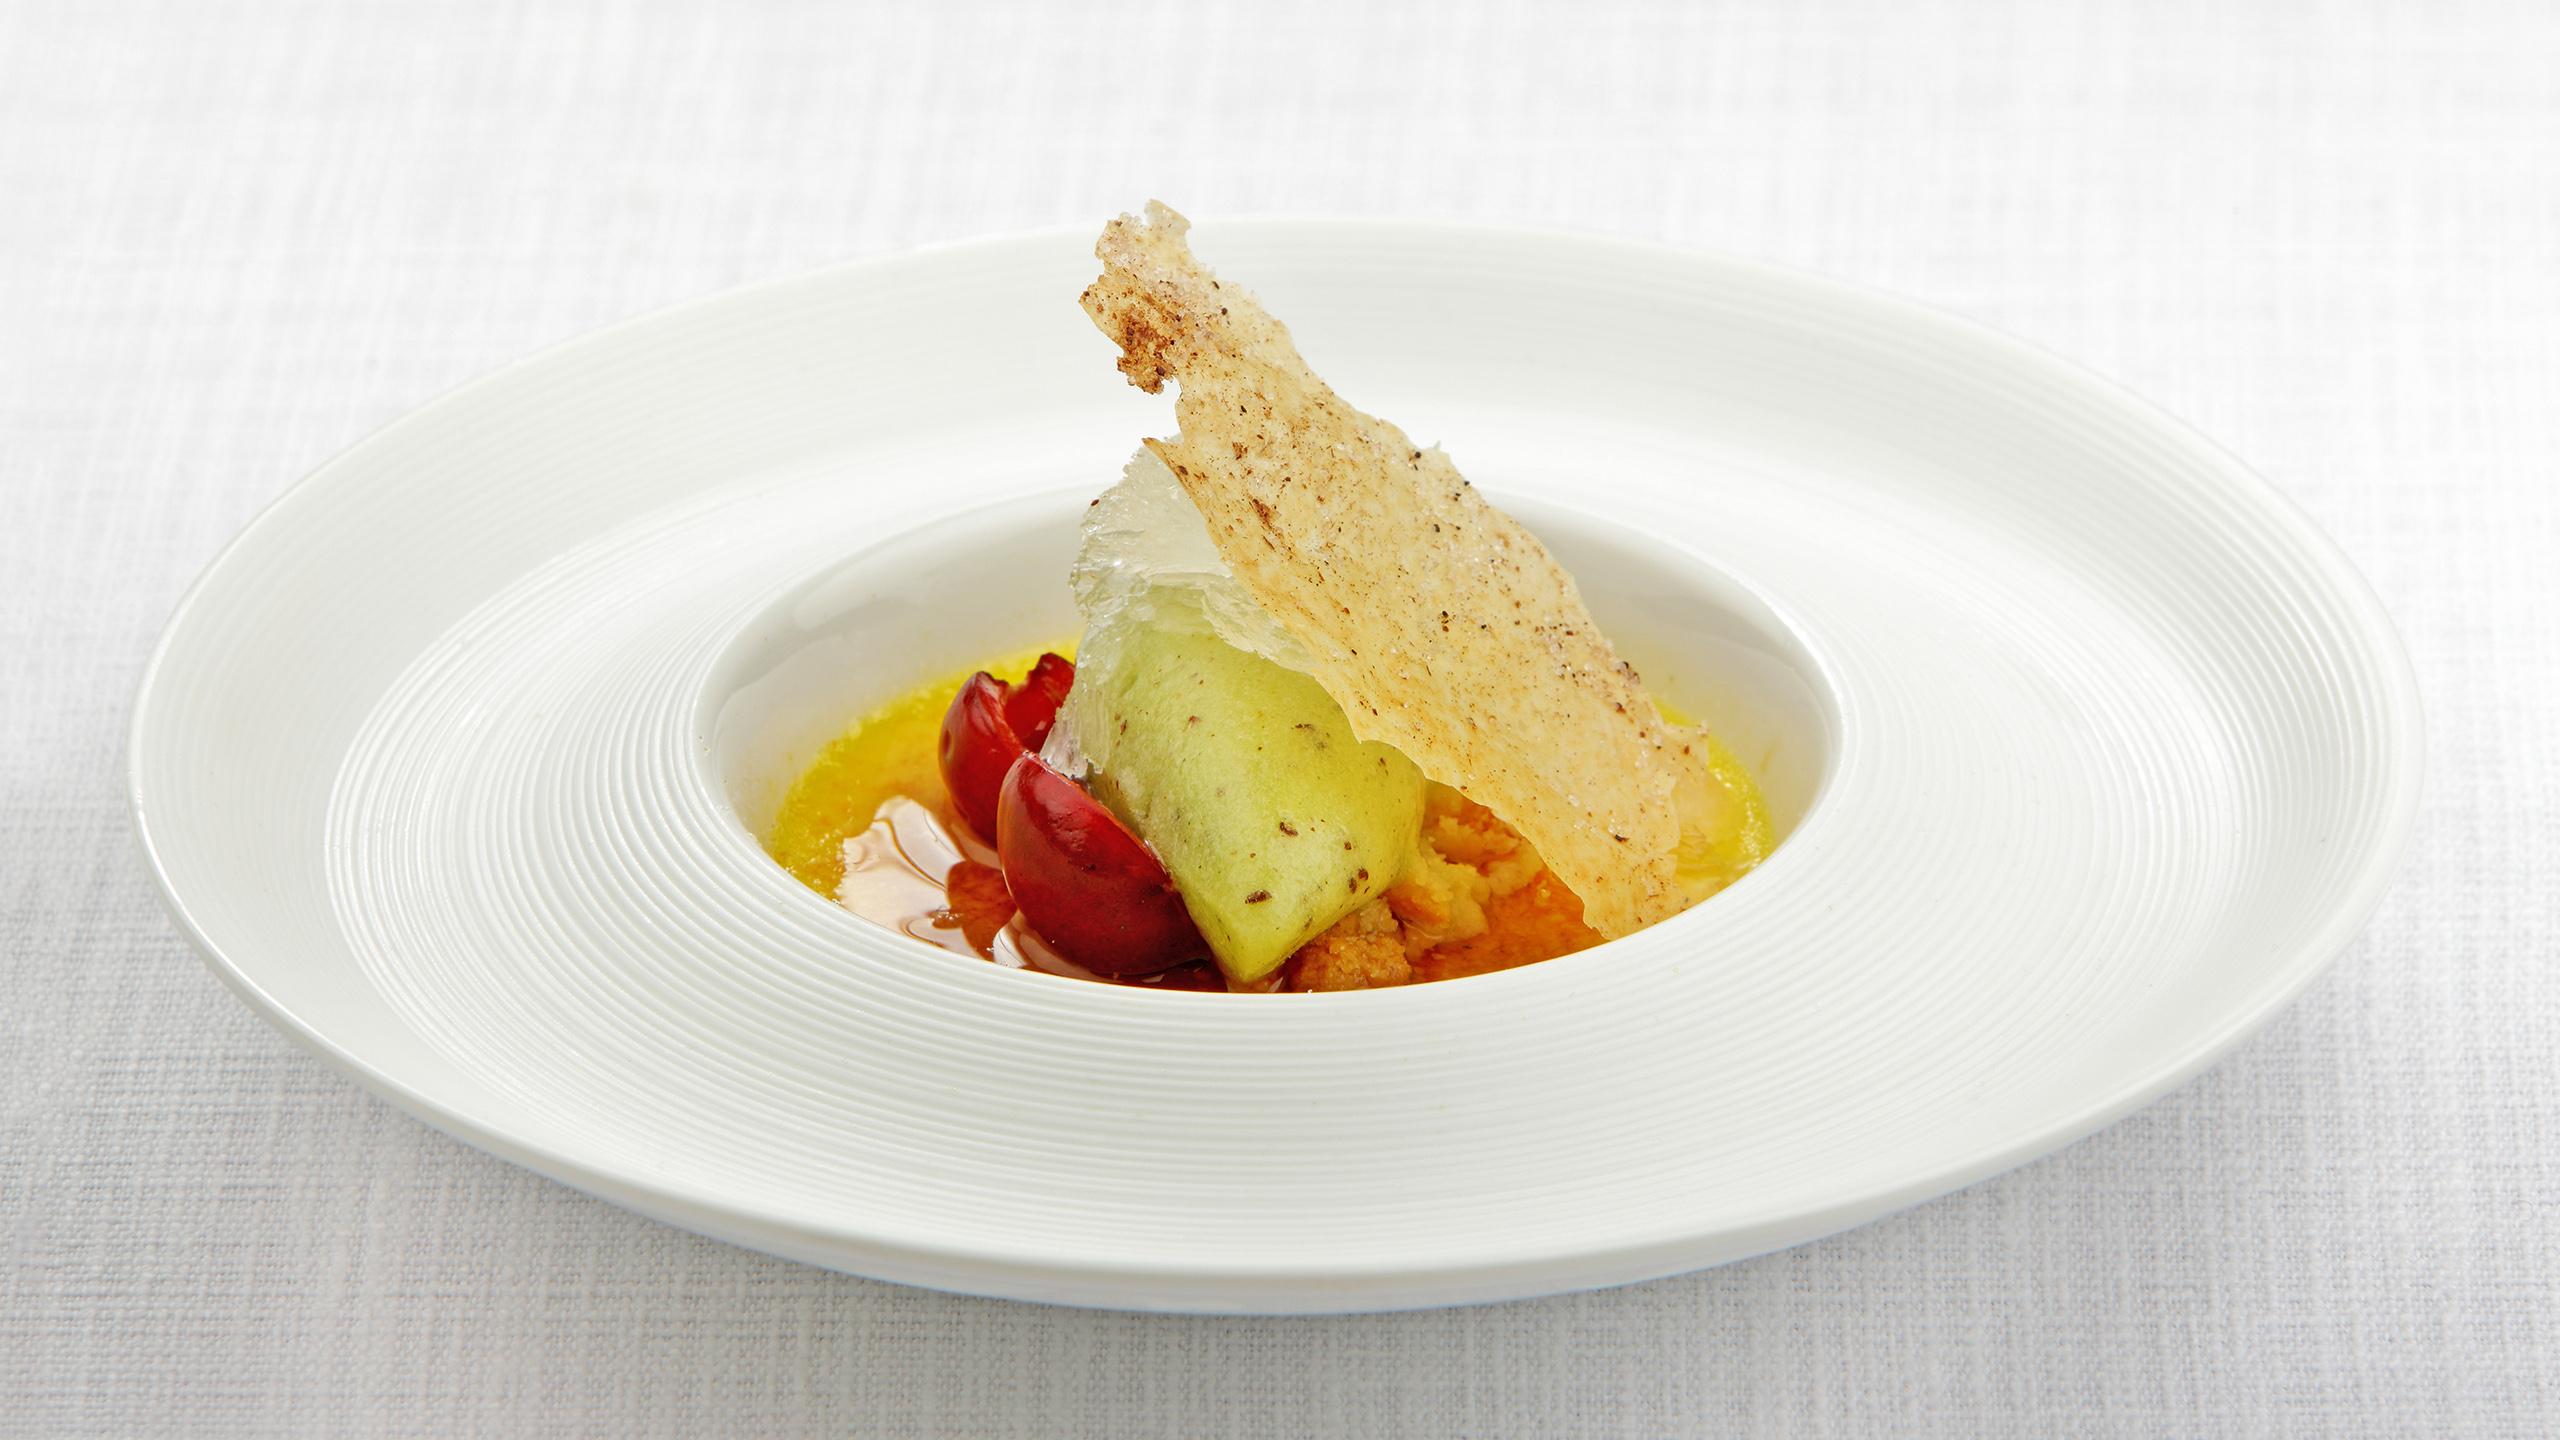 gastronomia 46 tafona